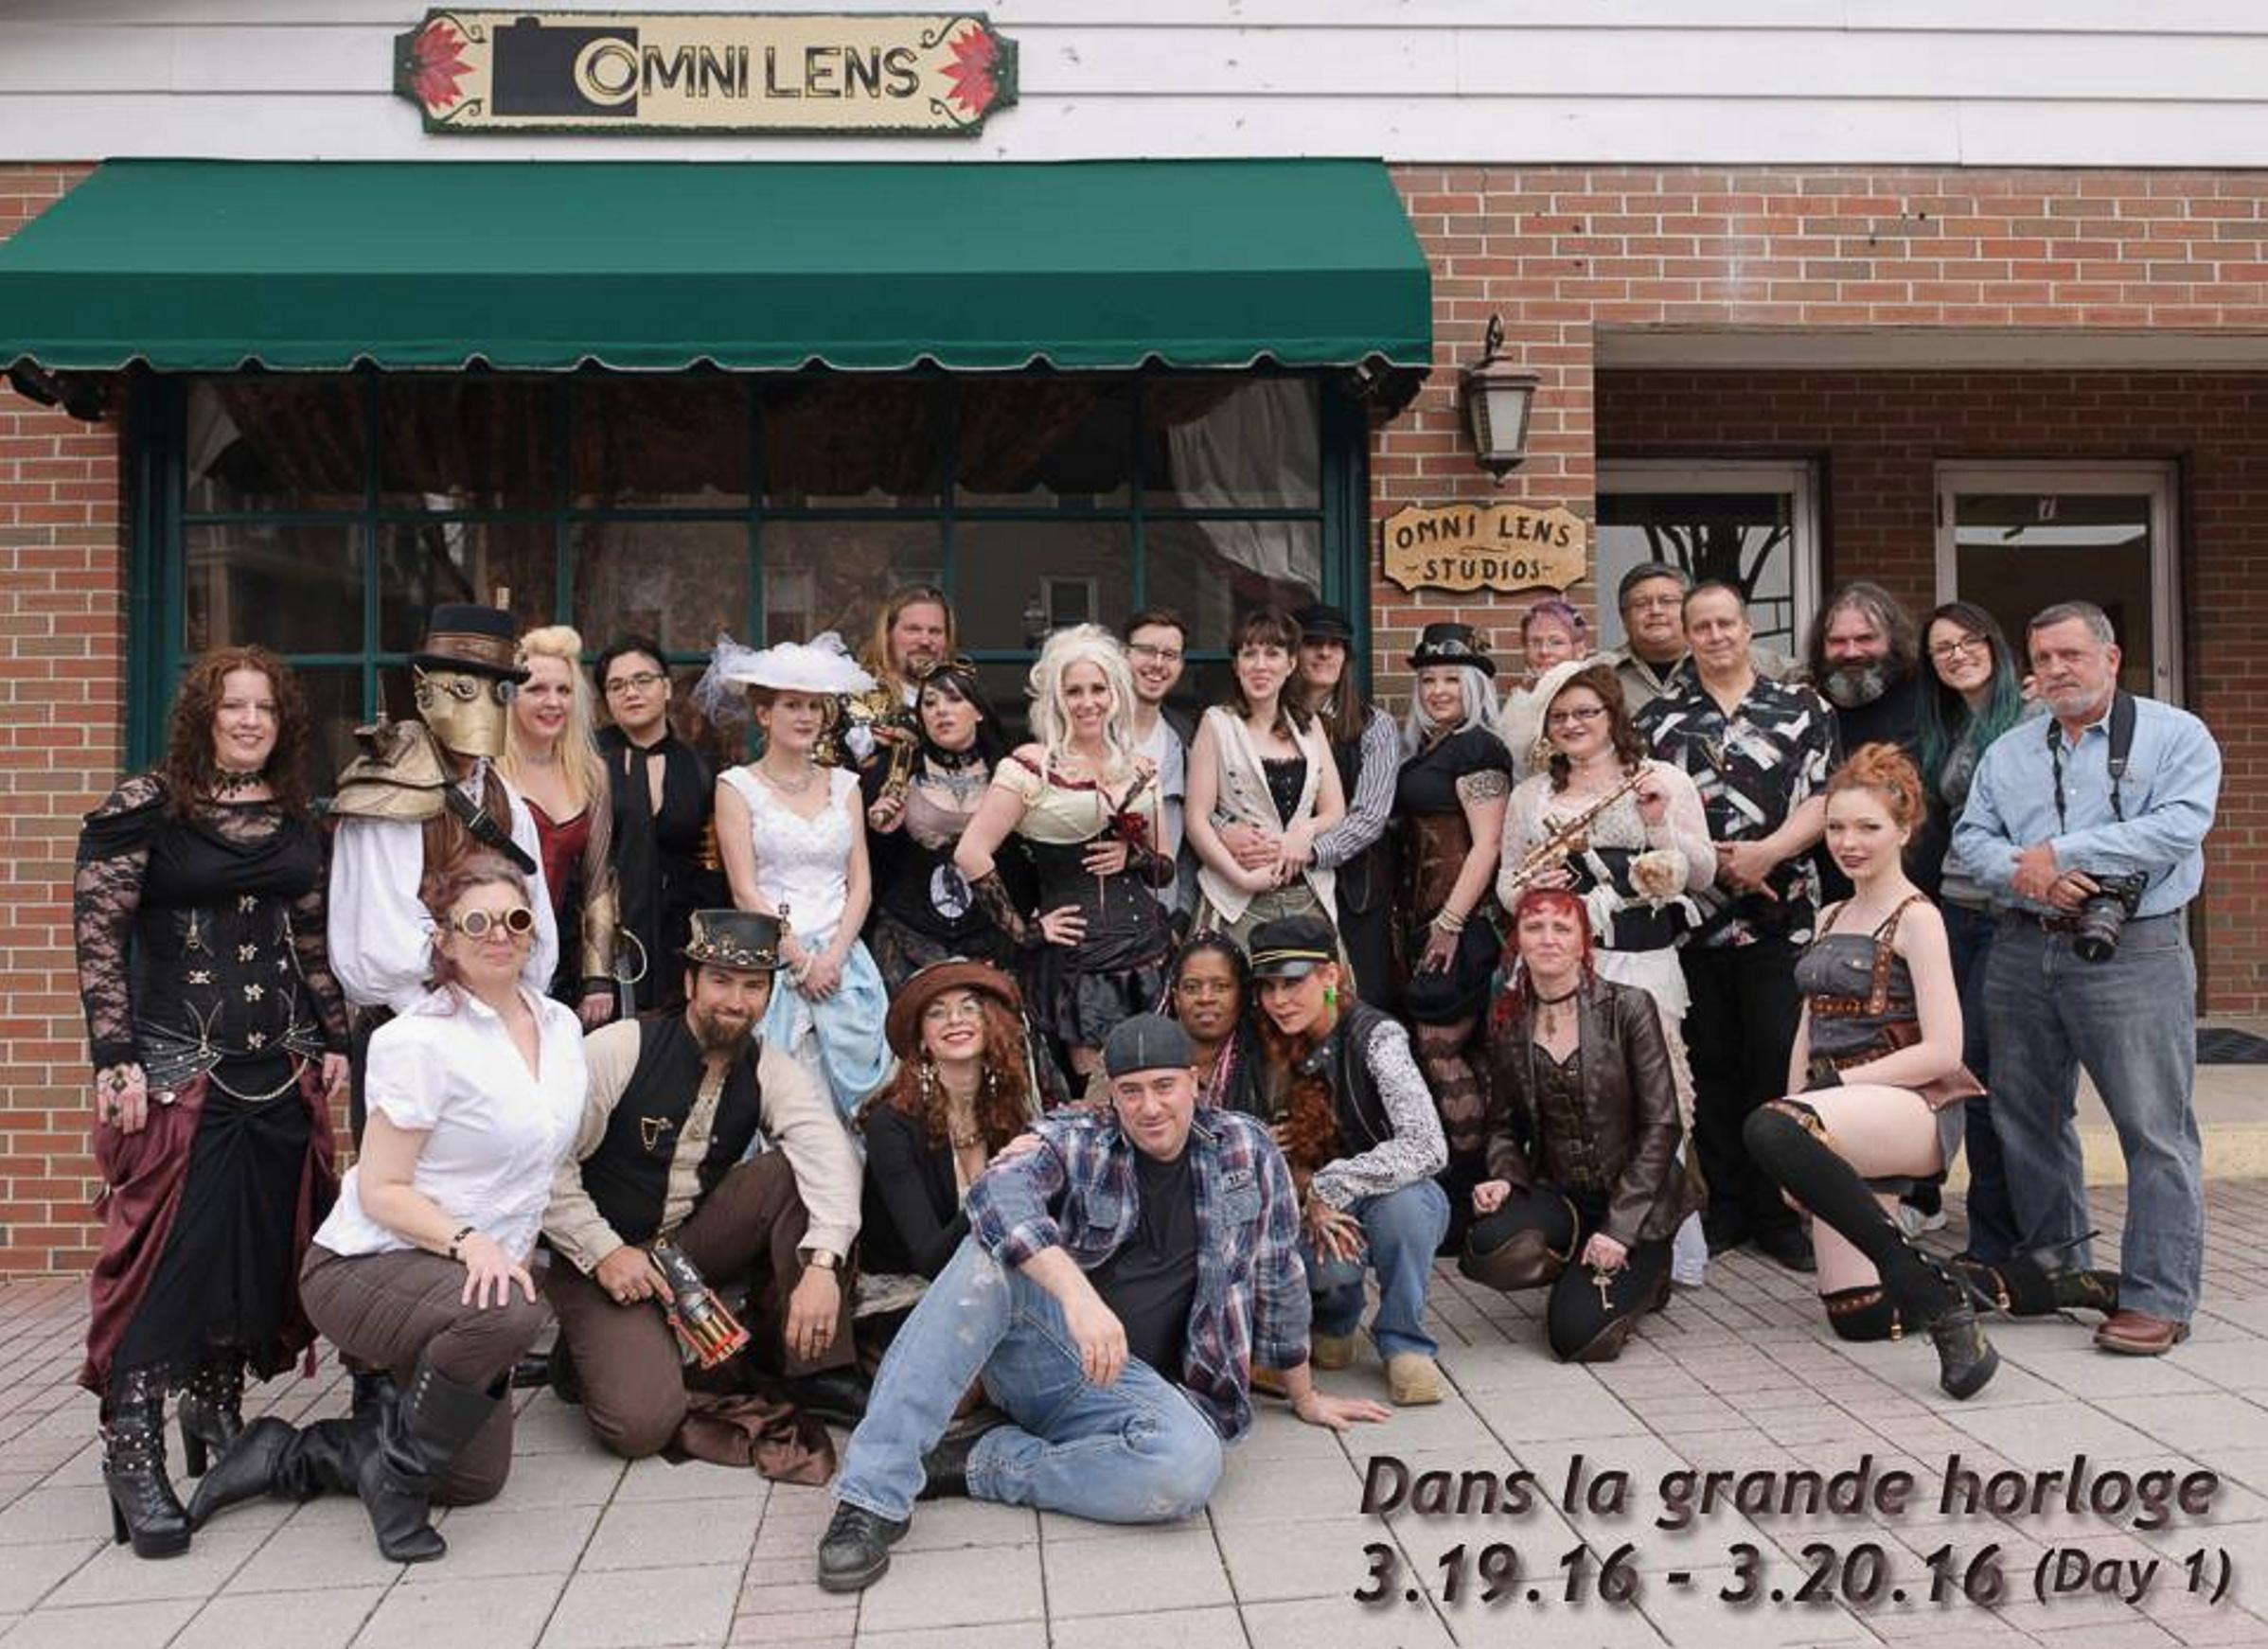 Omni Lens Studios steam punk group shot